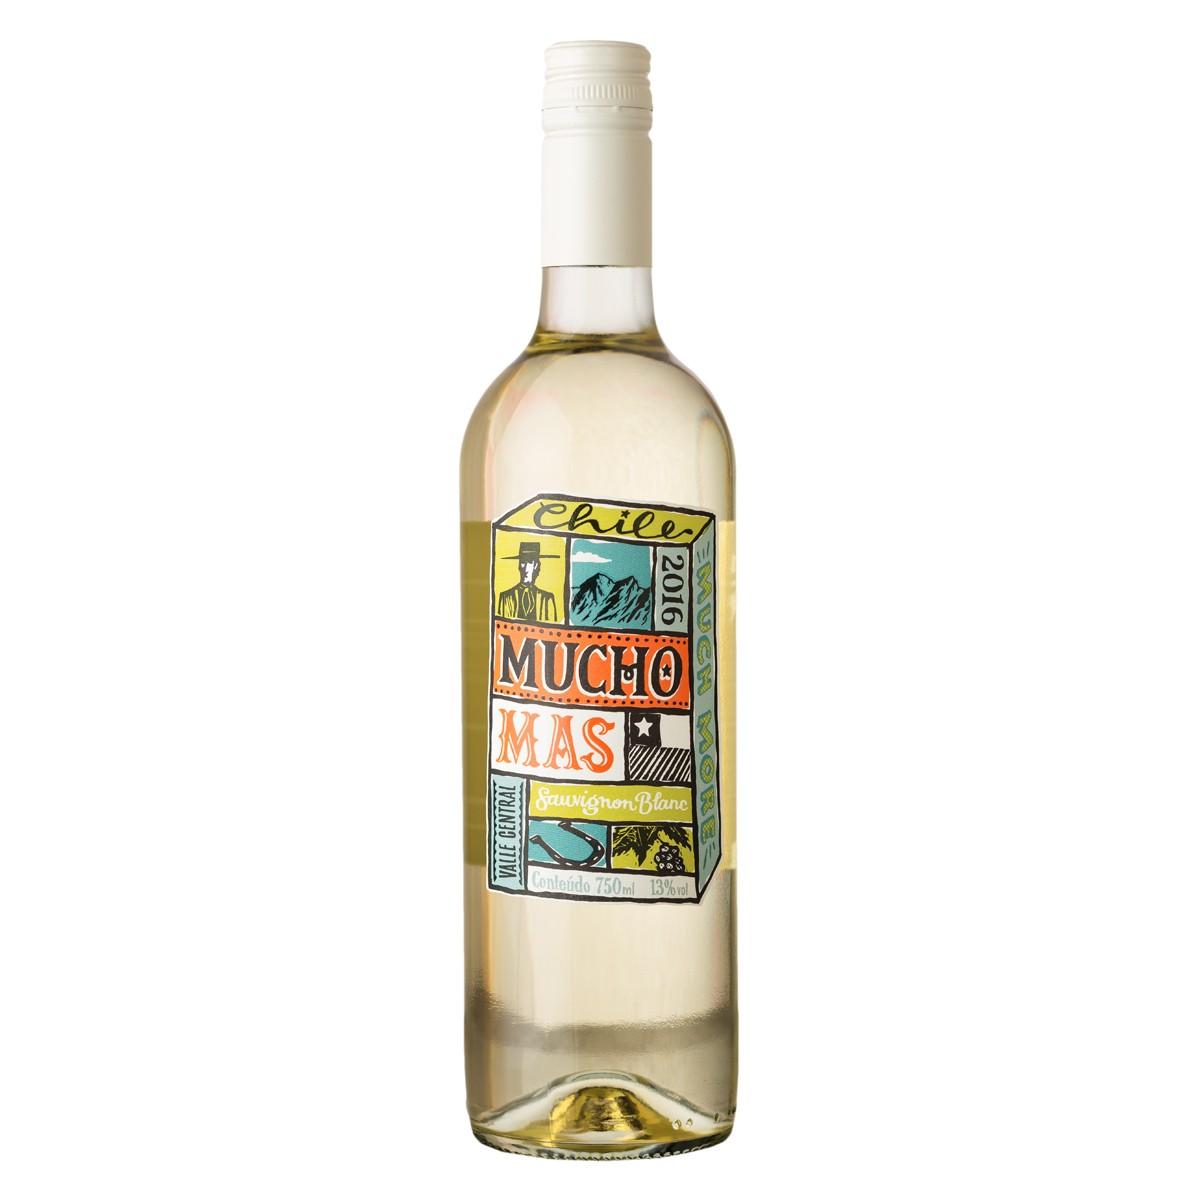 Mucho Mas Sauvignon Blanc